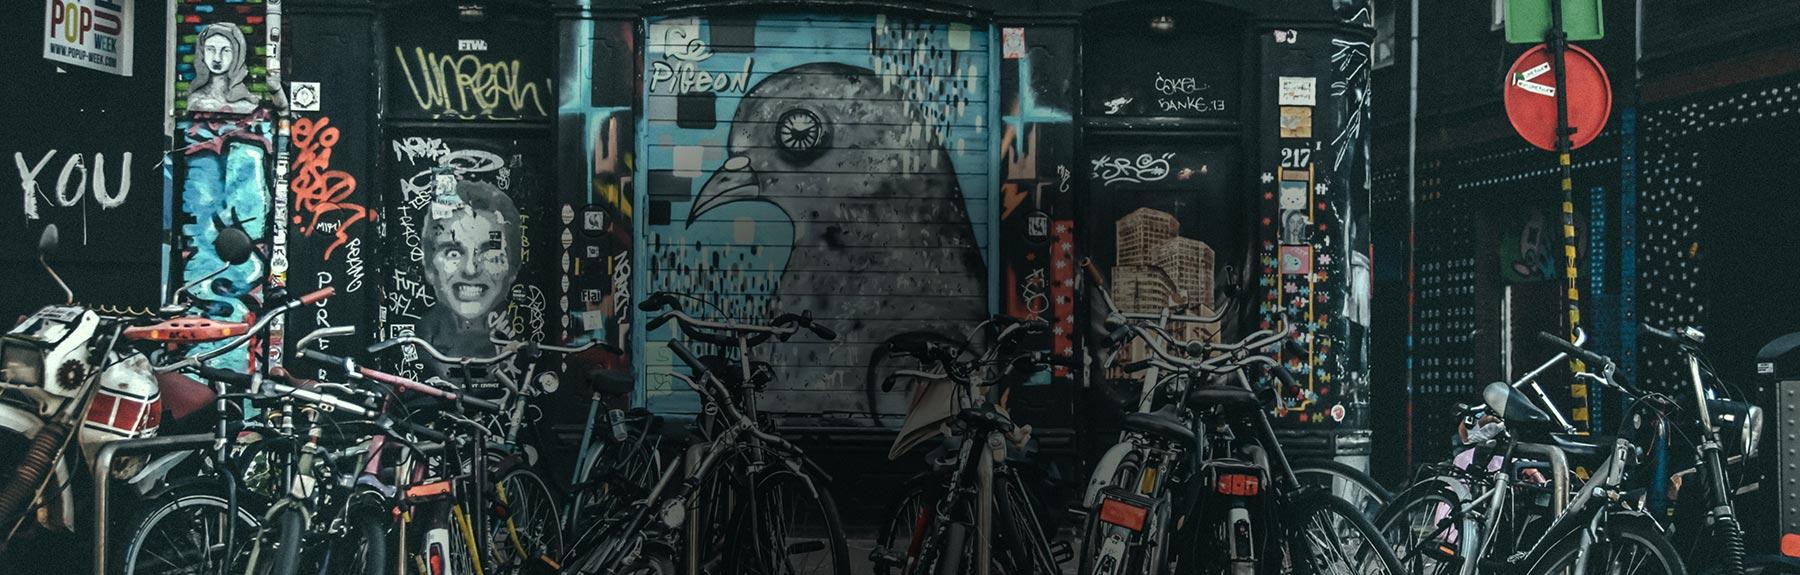 Art or vandalism? The painted bikes of Amsterdam